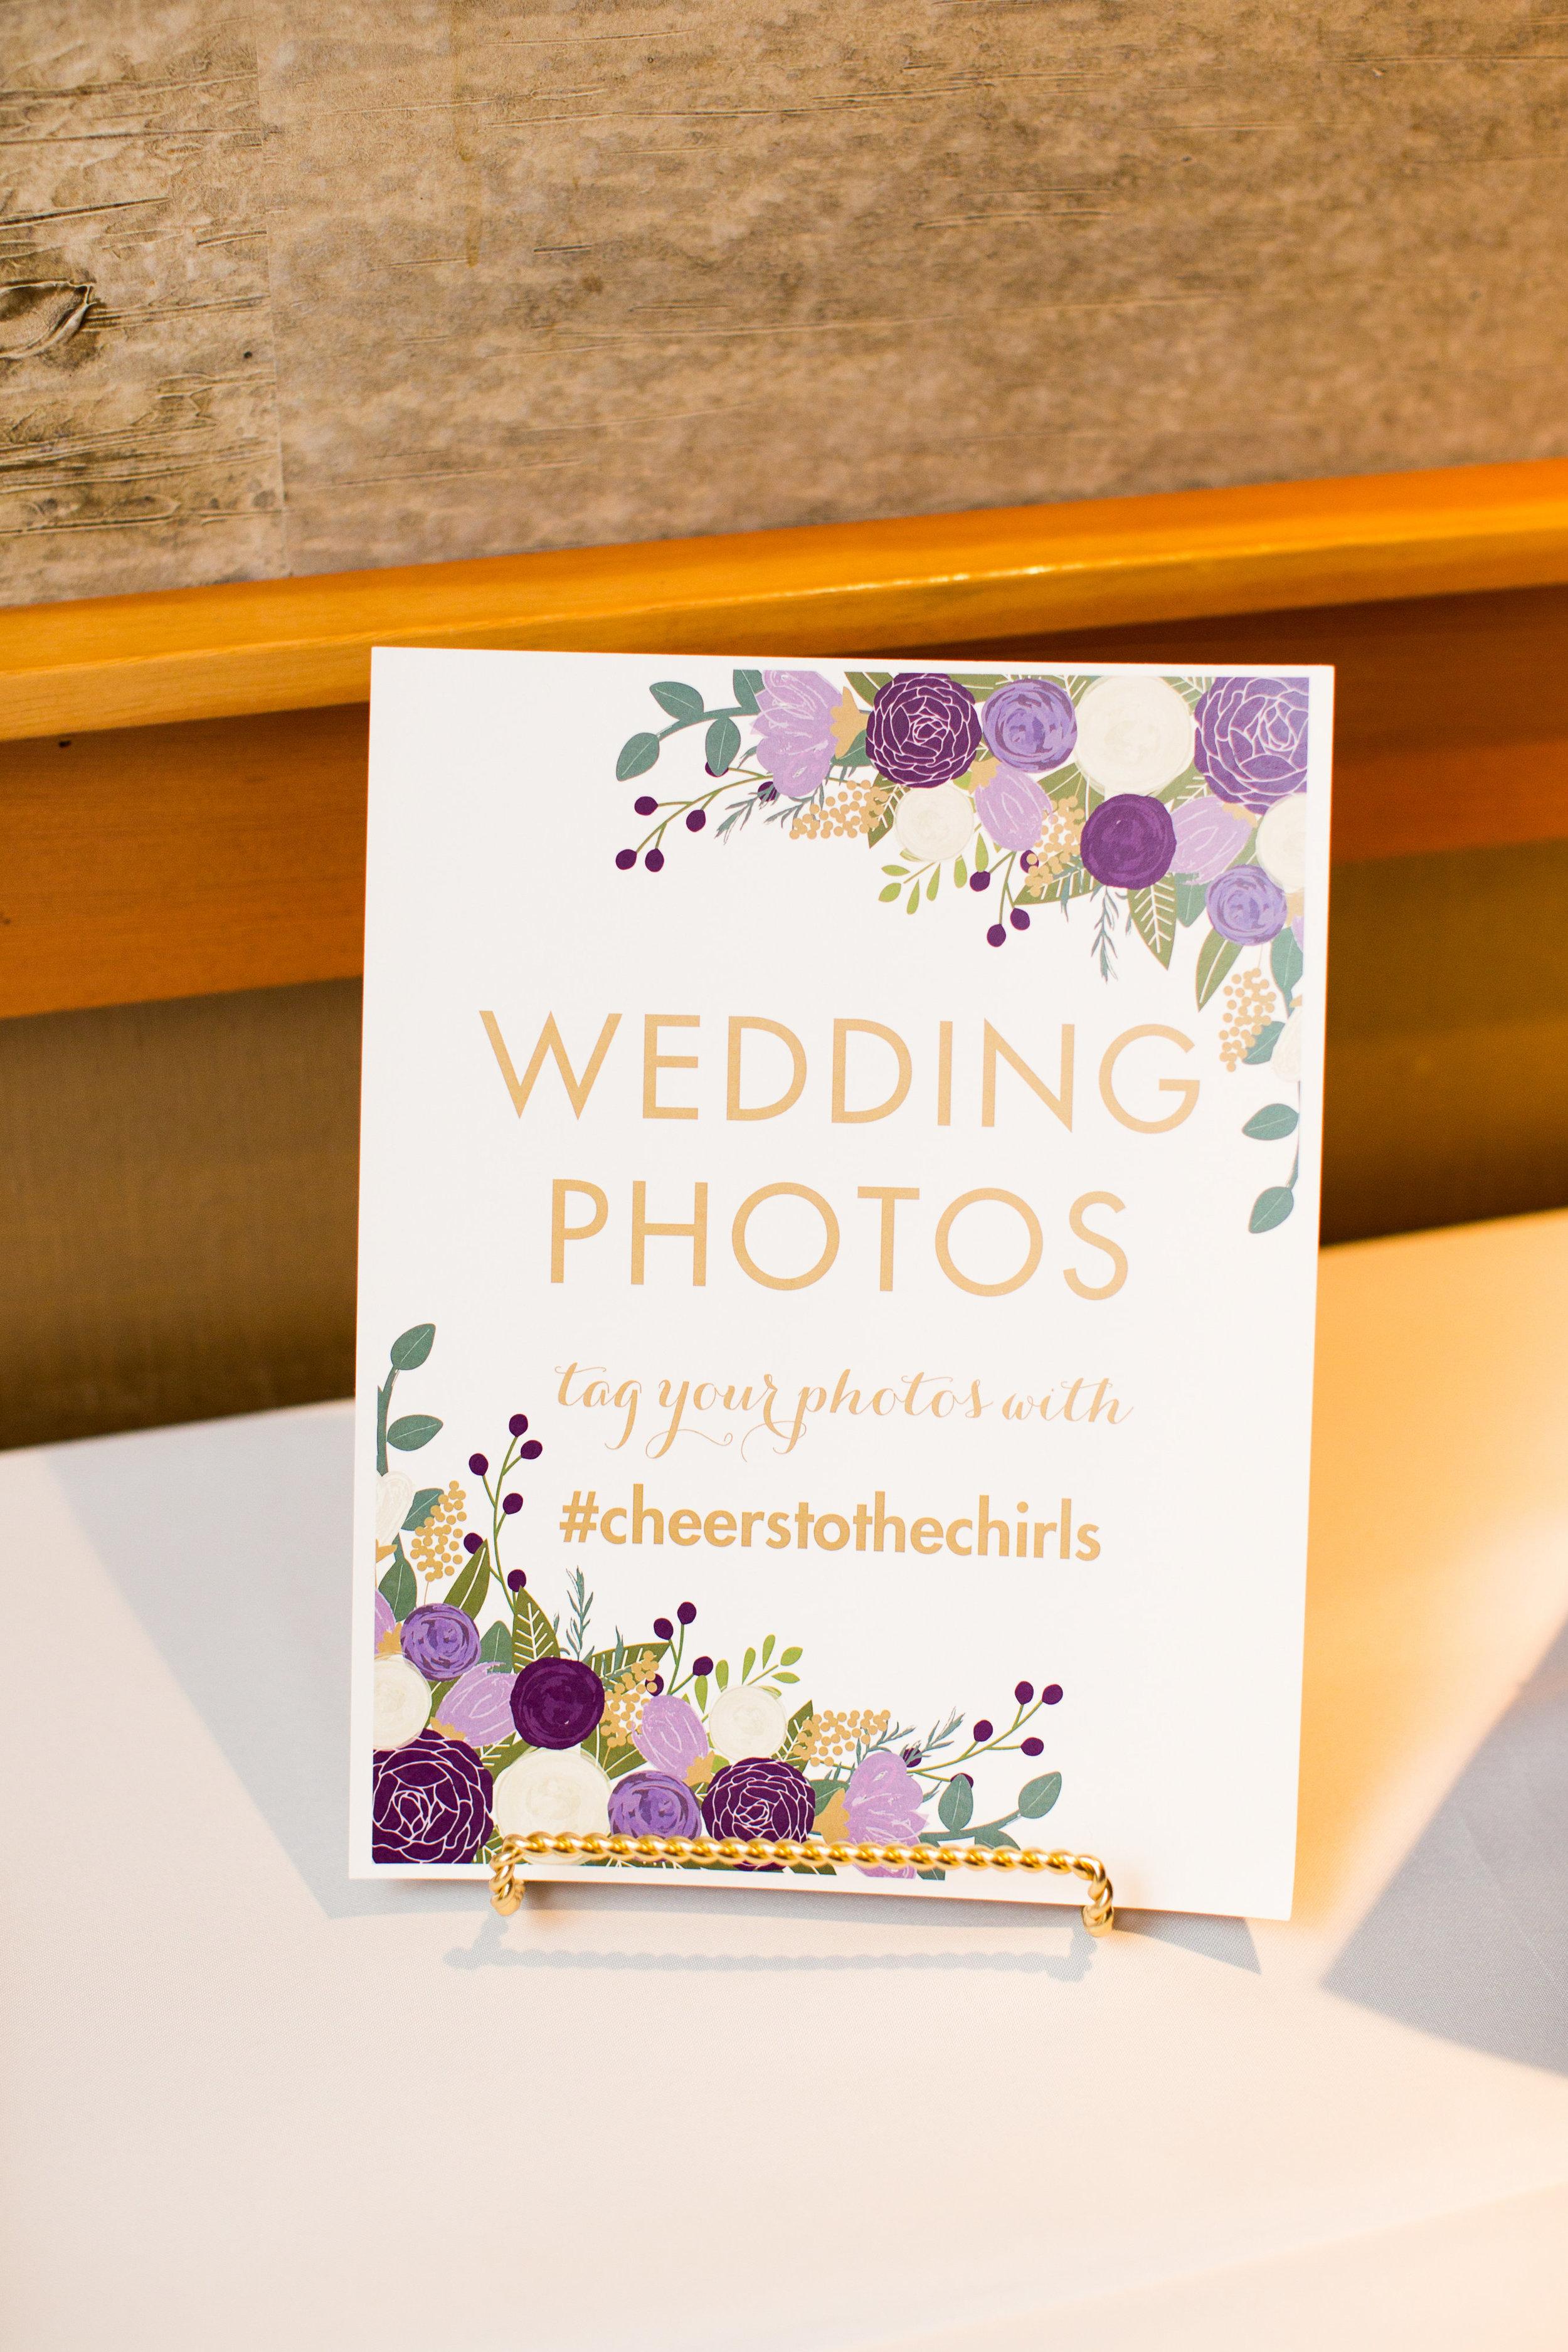 Seattle Wedding Planner, Wedding Wise | Ciccarelli Photography | Edgewater Hotel Wedding | Wedding hashtag sign